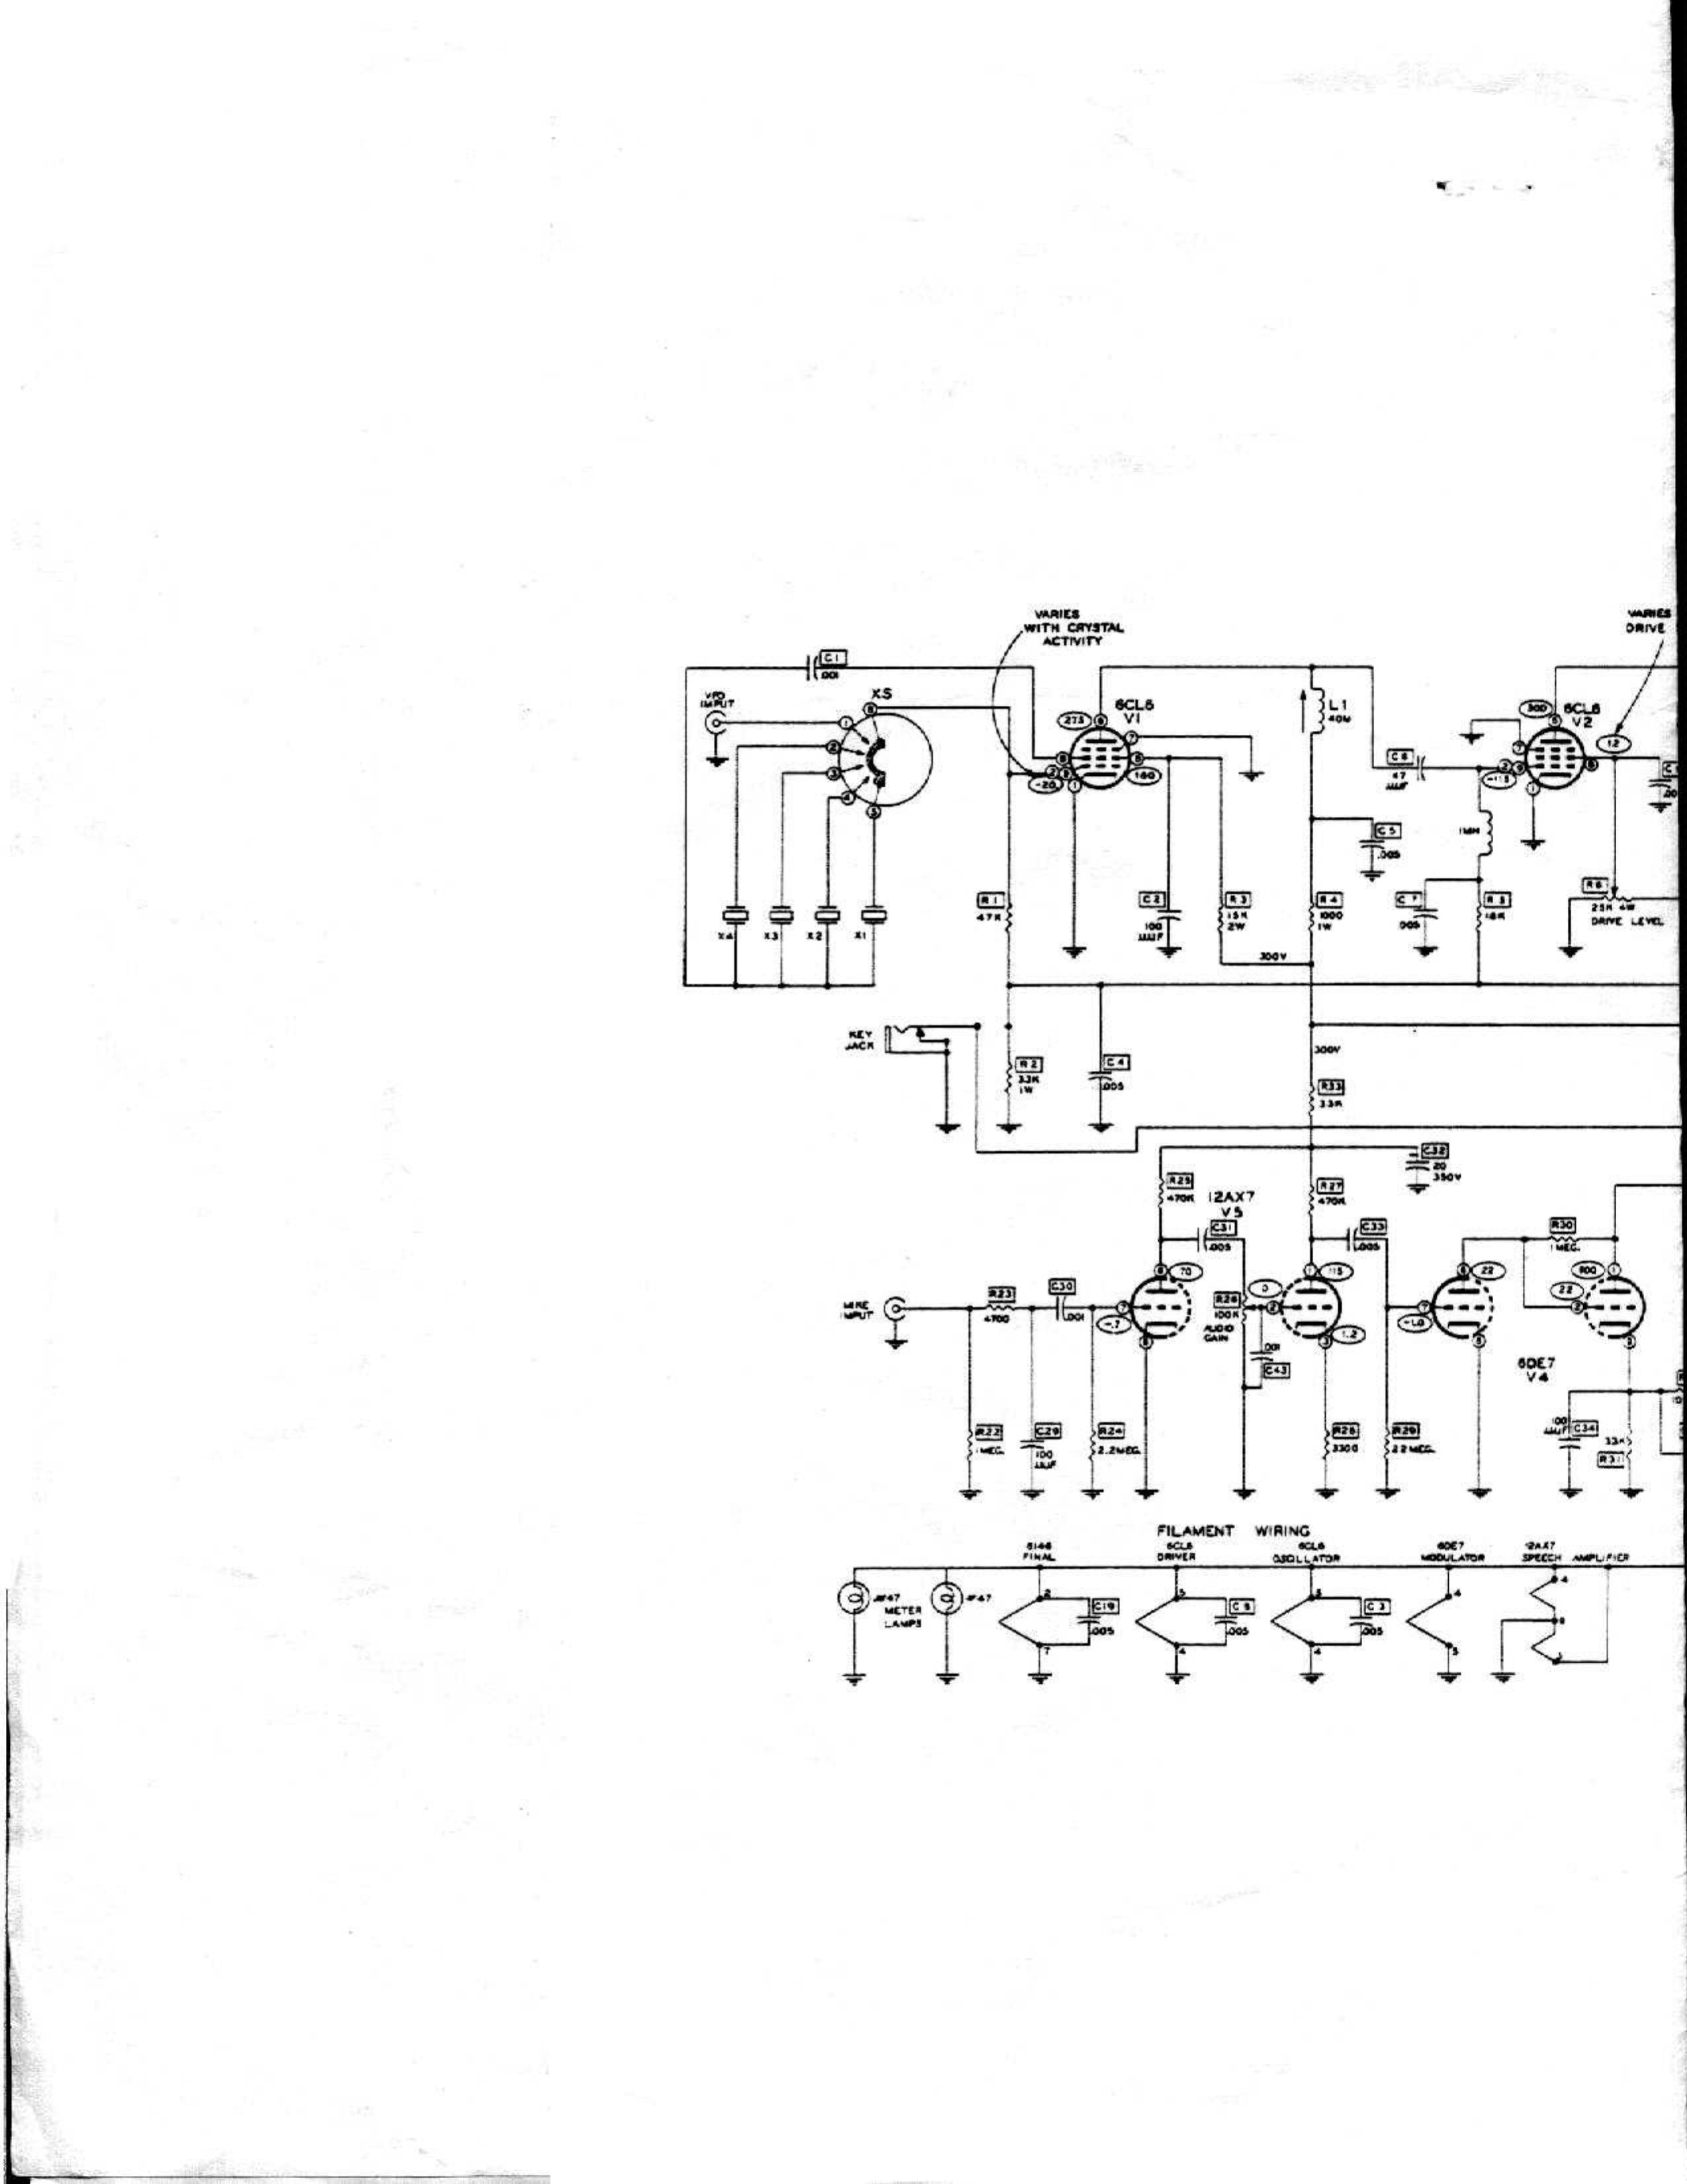 dx60a 12 Volt Wiring manual source